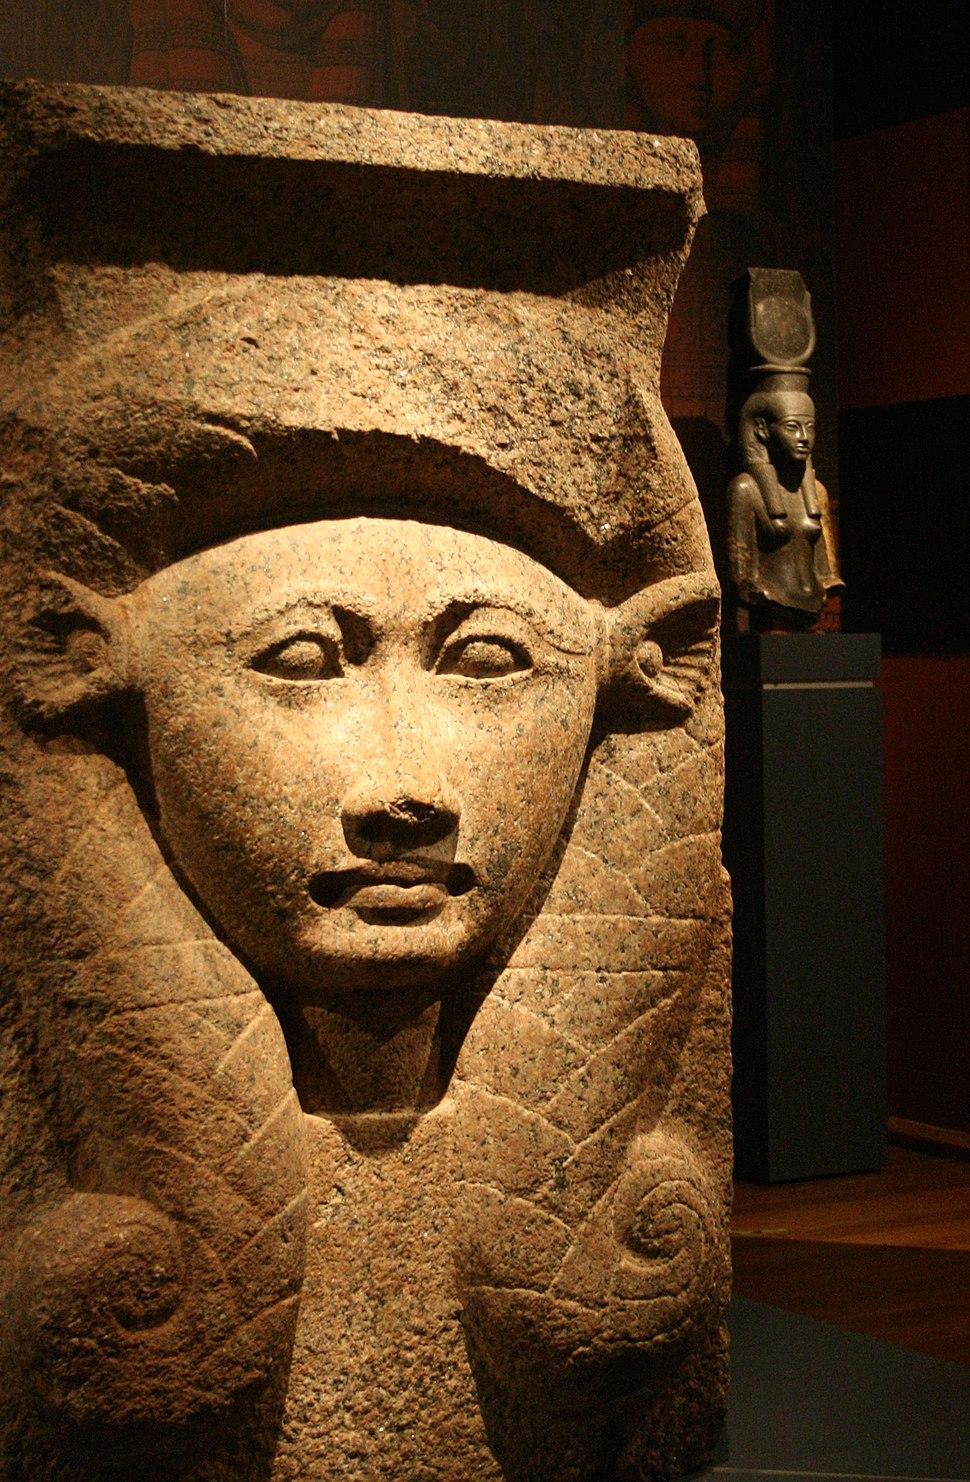 Hathor capital on display at the Nicholson Museum